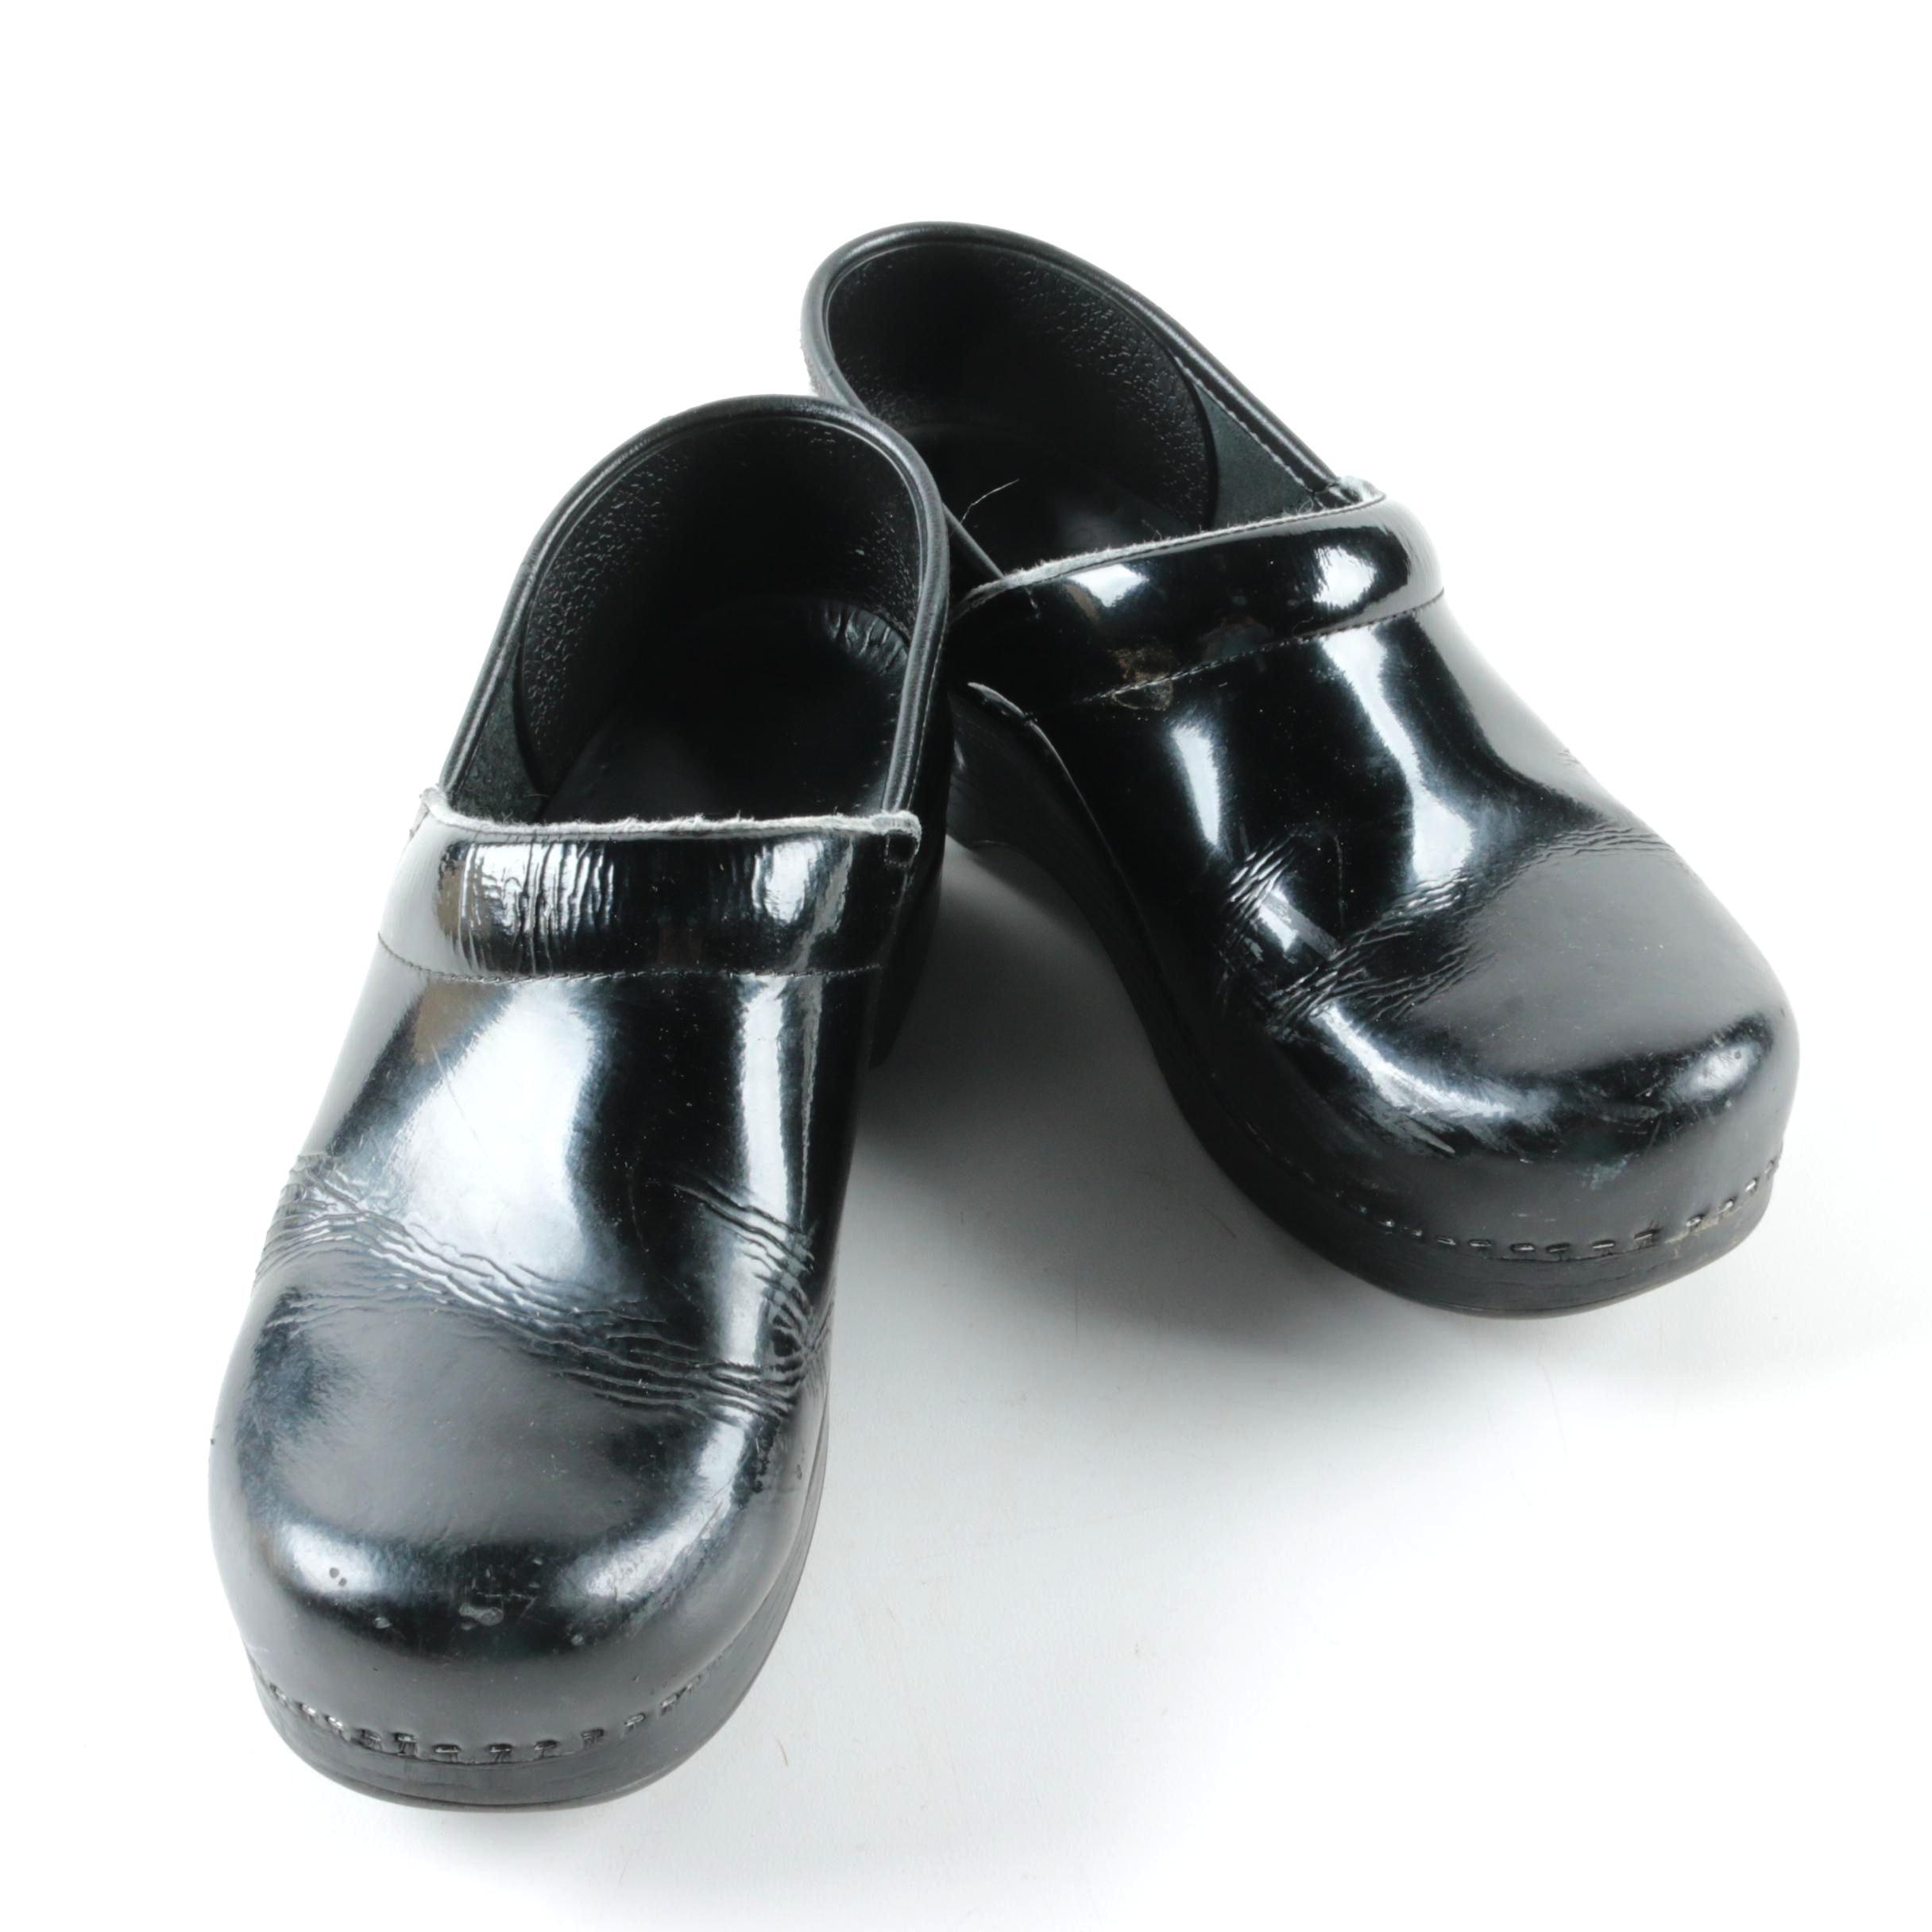 Dansko Professional Patent Leather Clogs